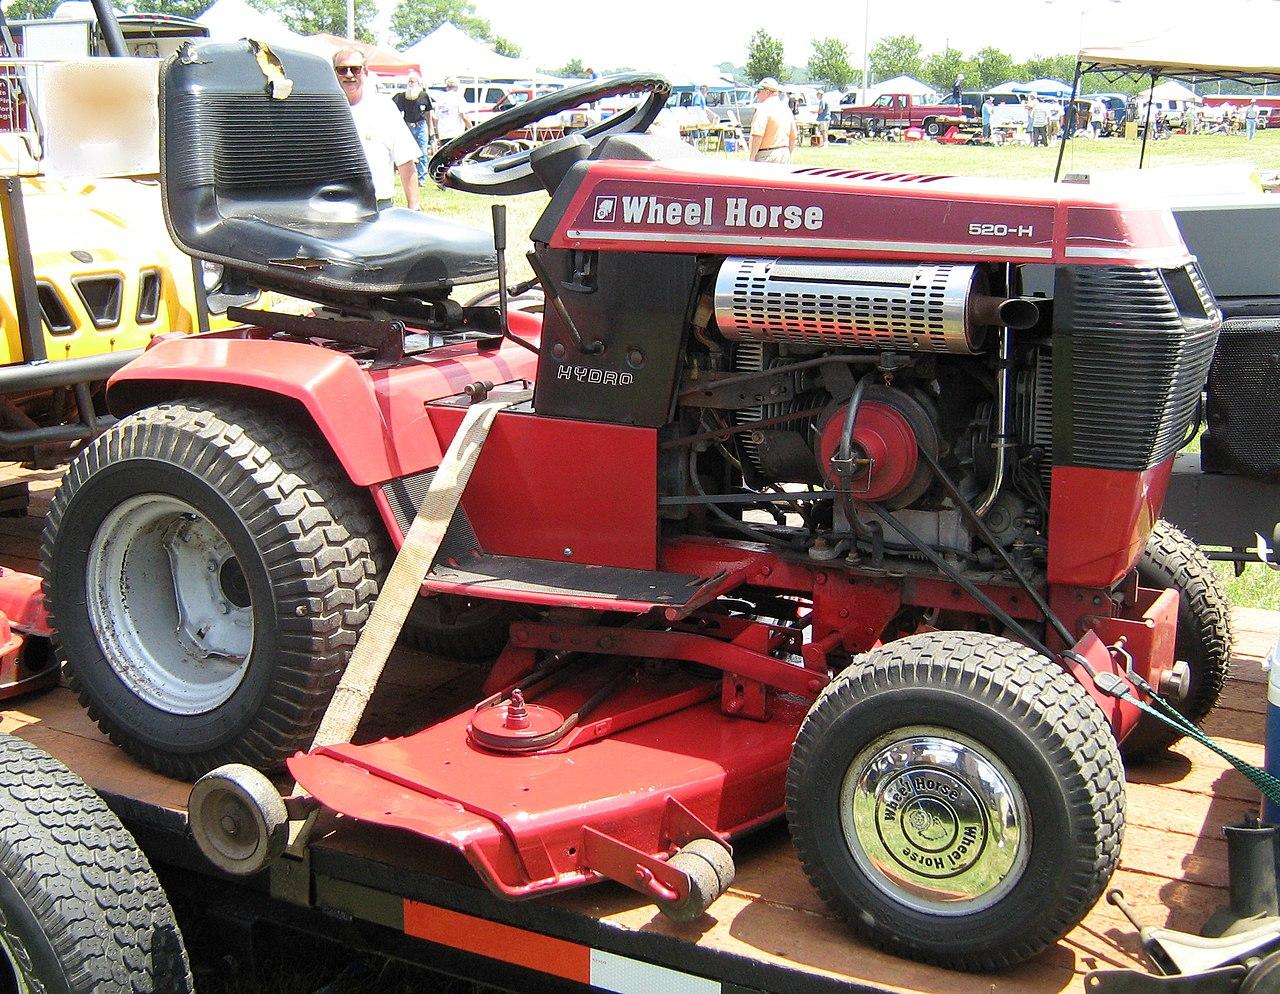 File:1986 Wheel Horse 520-H garden tractor-s.jpg - Wikimedia CommonsWikimedia Commons